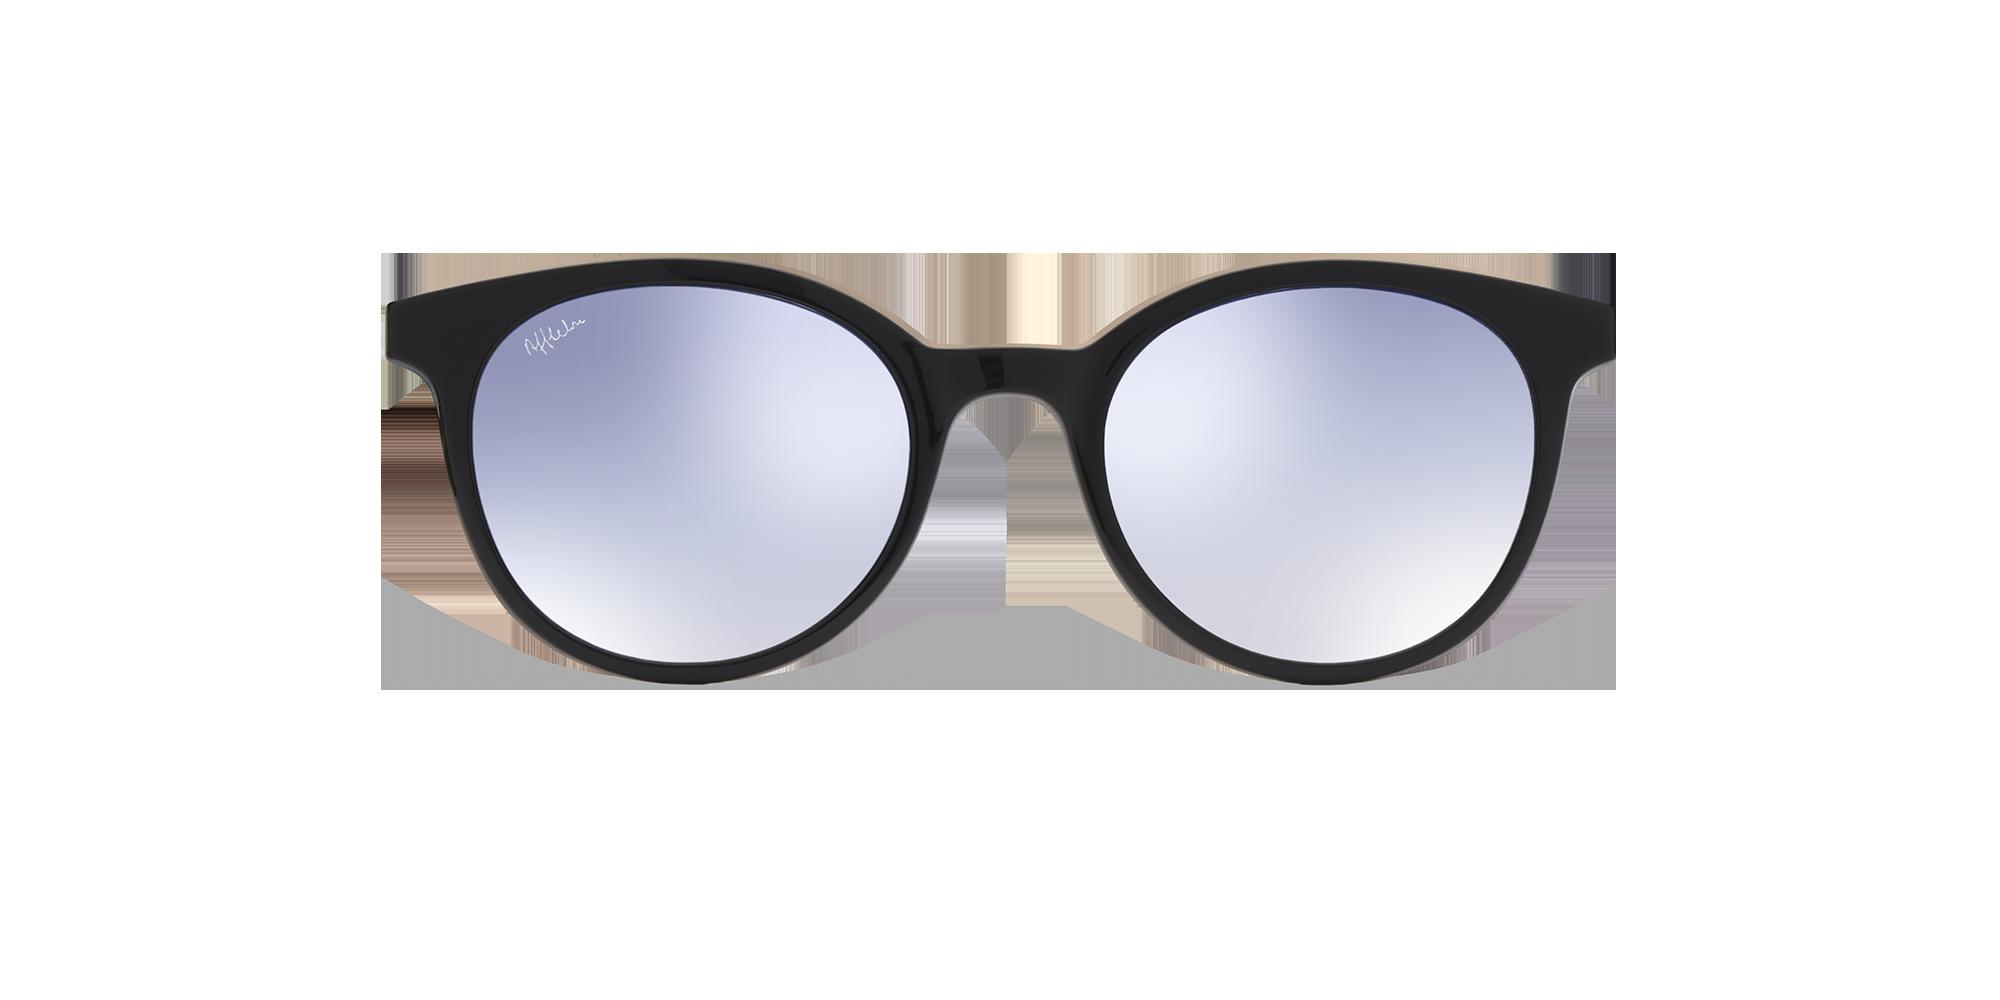 afflelou/france/products/smart_clip/clips_glasses/TMK36TBBK014819.png